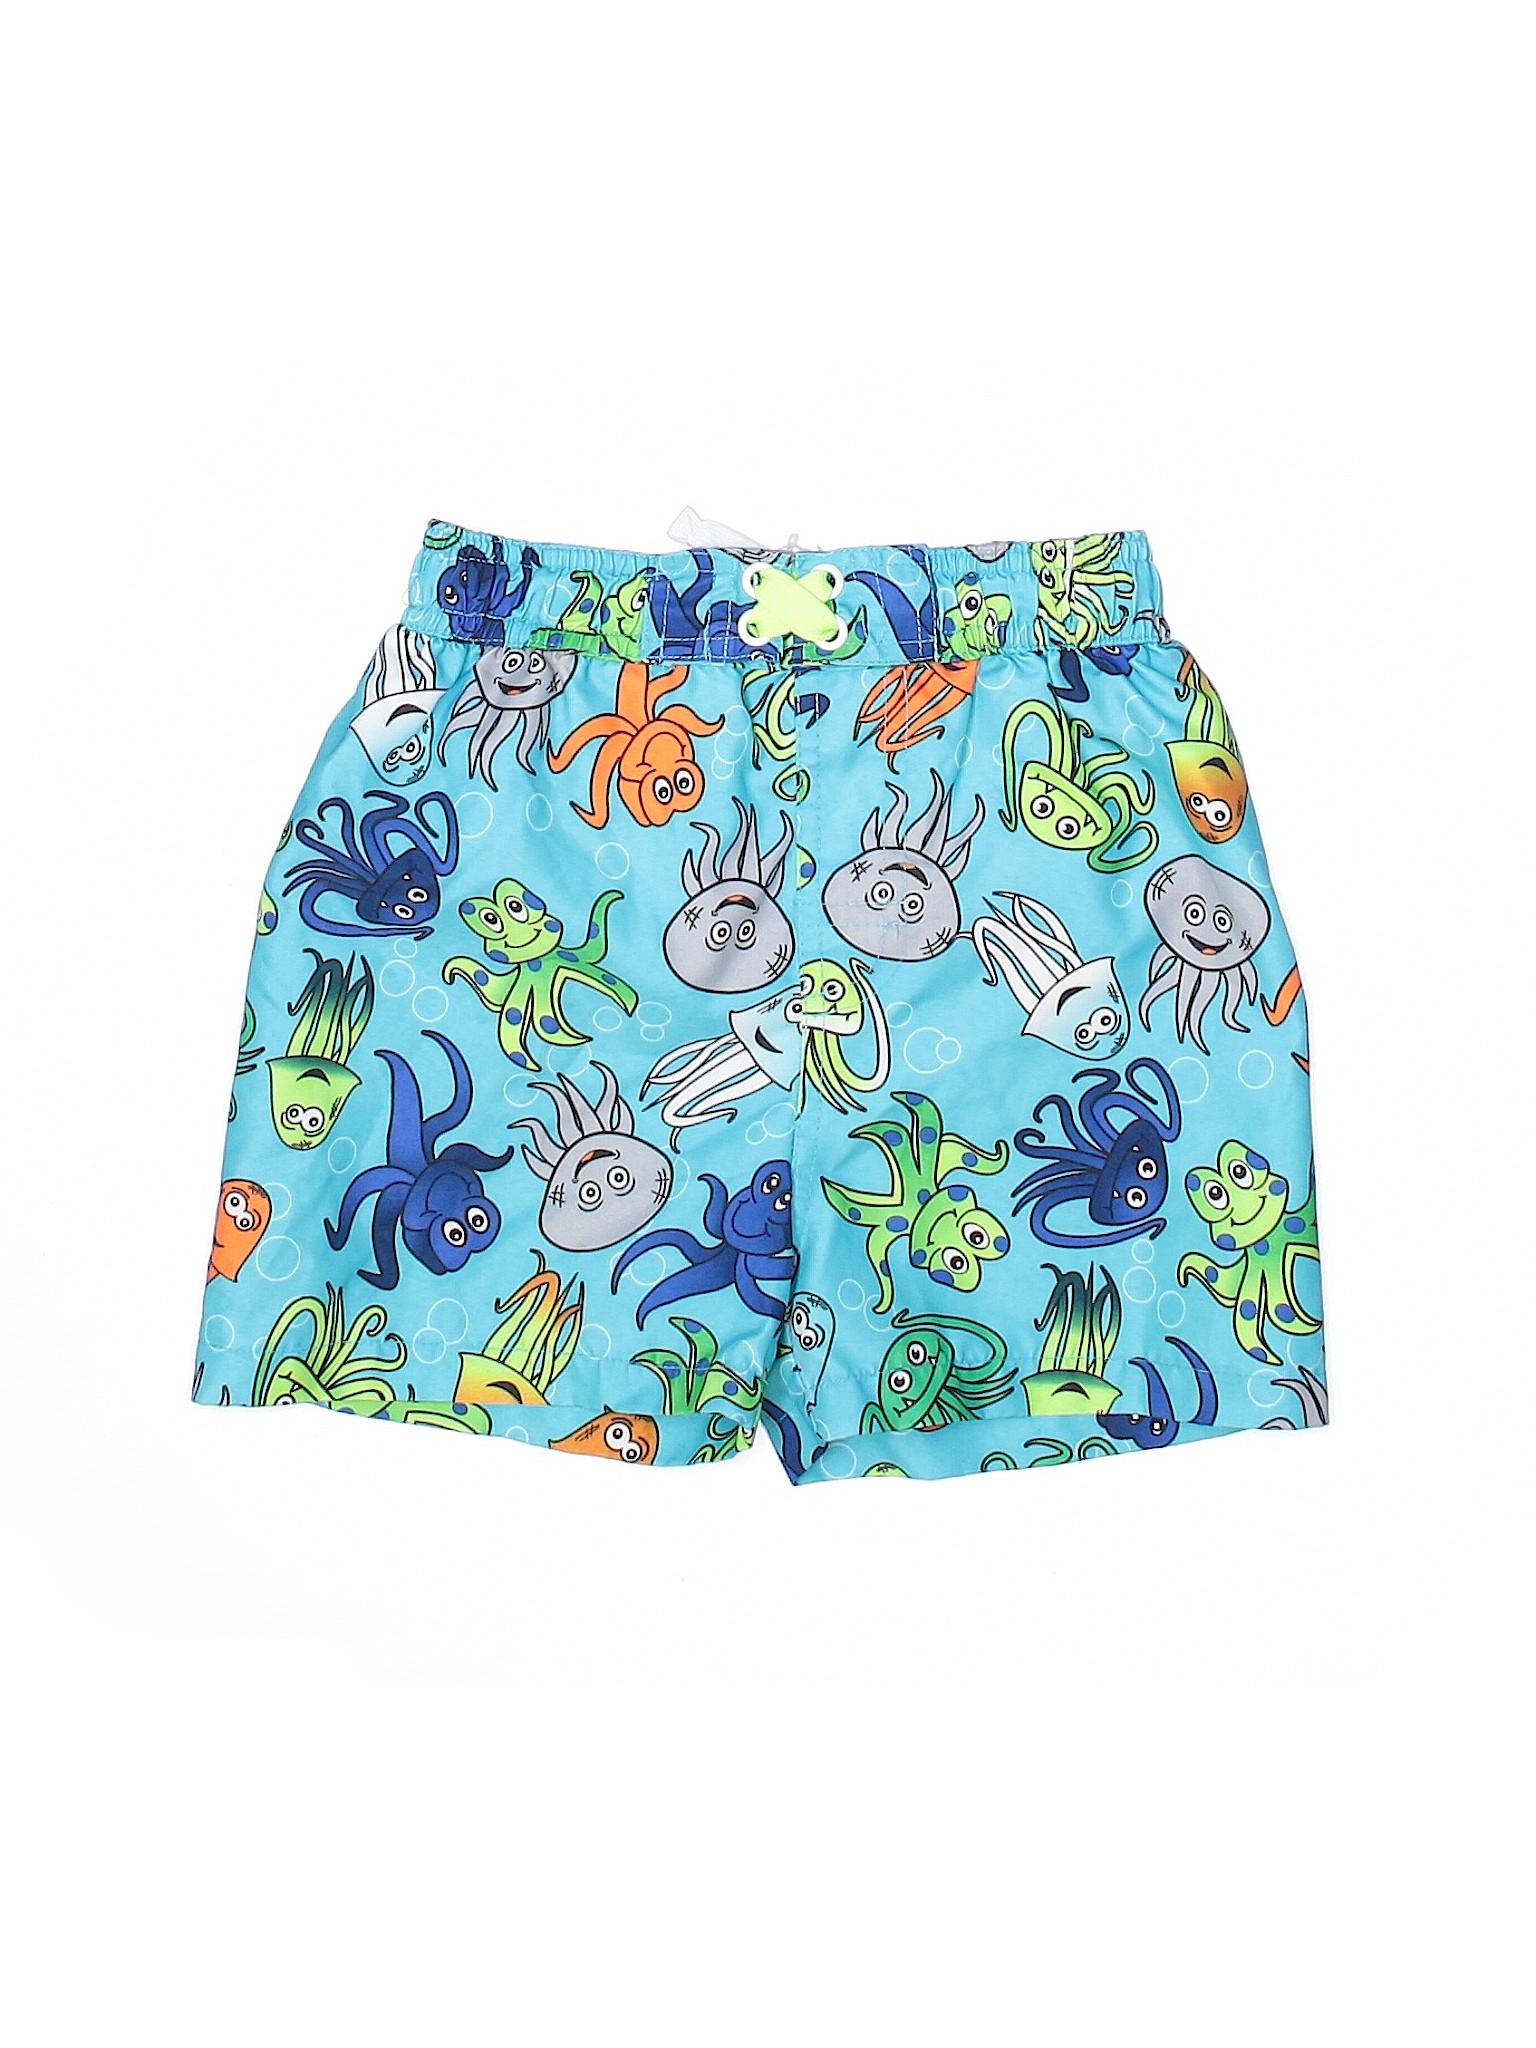 NEW Toddler  Mick and Mack LTD boys swim trunks board shorts 4 T UPF 50